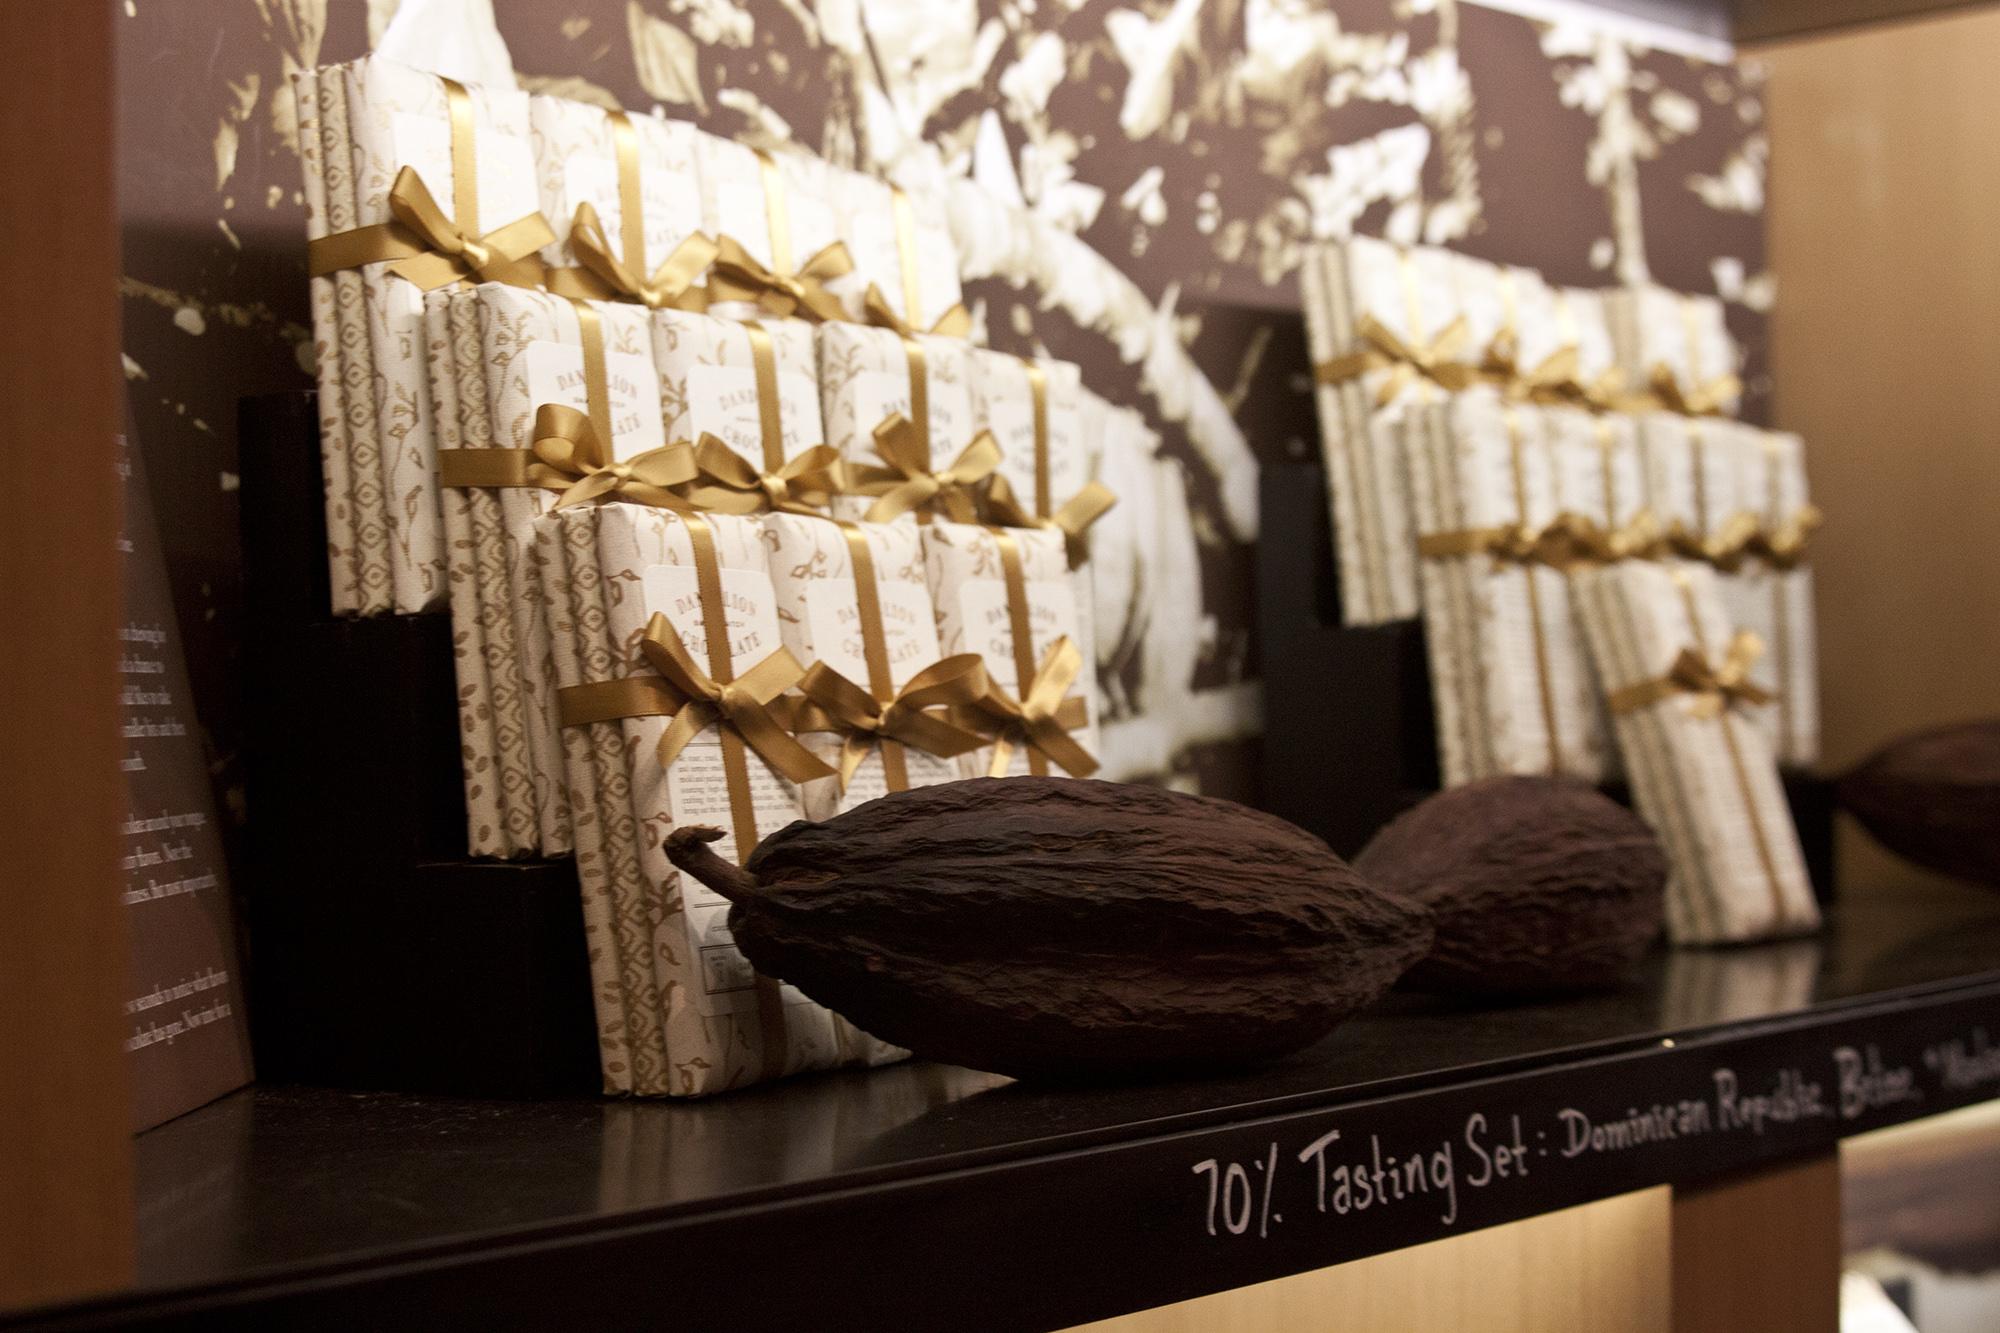 Dandelion Chocolate, San Francisco